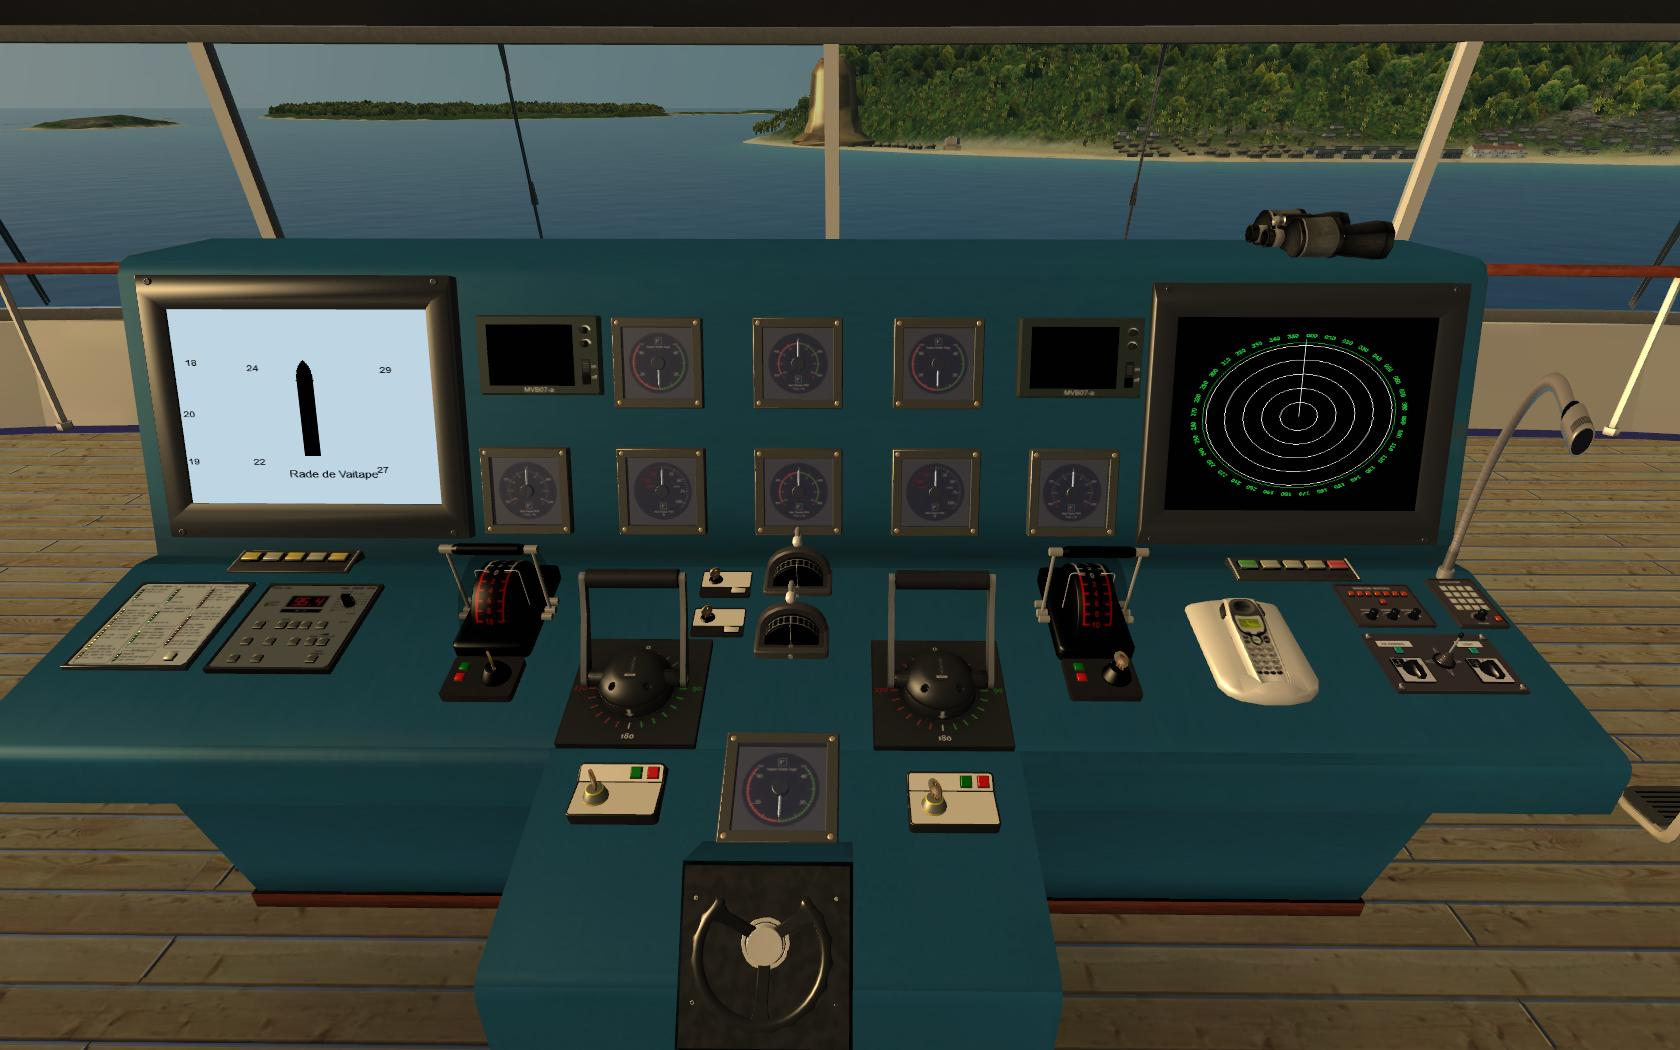 ShipSimcom Luxury Cruise Vessel MS Oceana DLC - Cruise ship controls